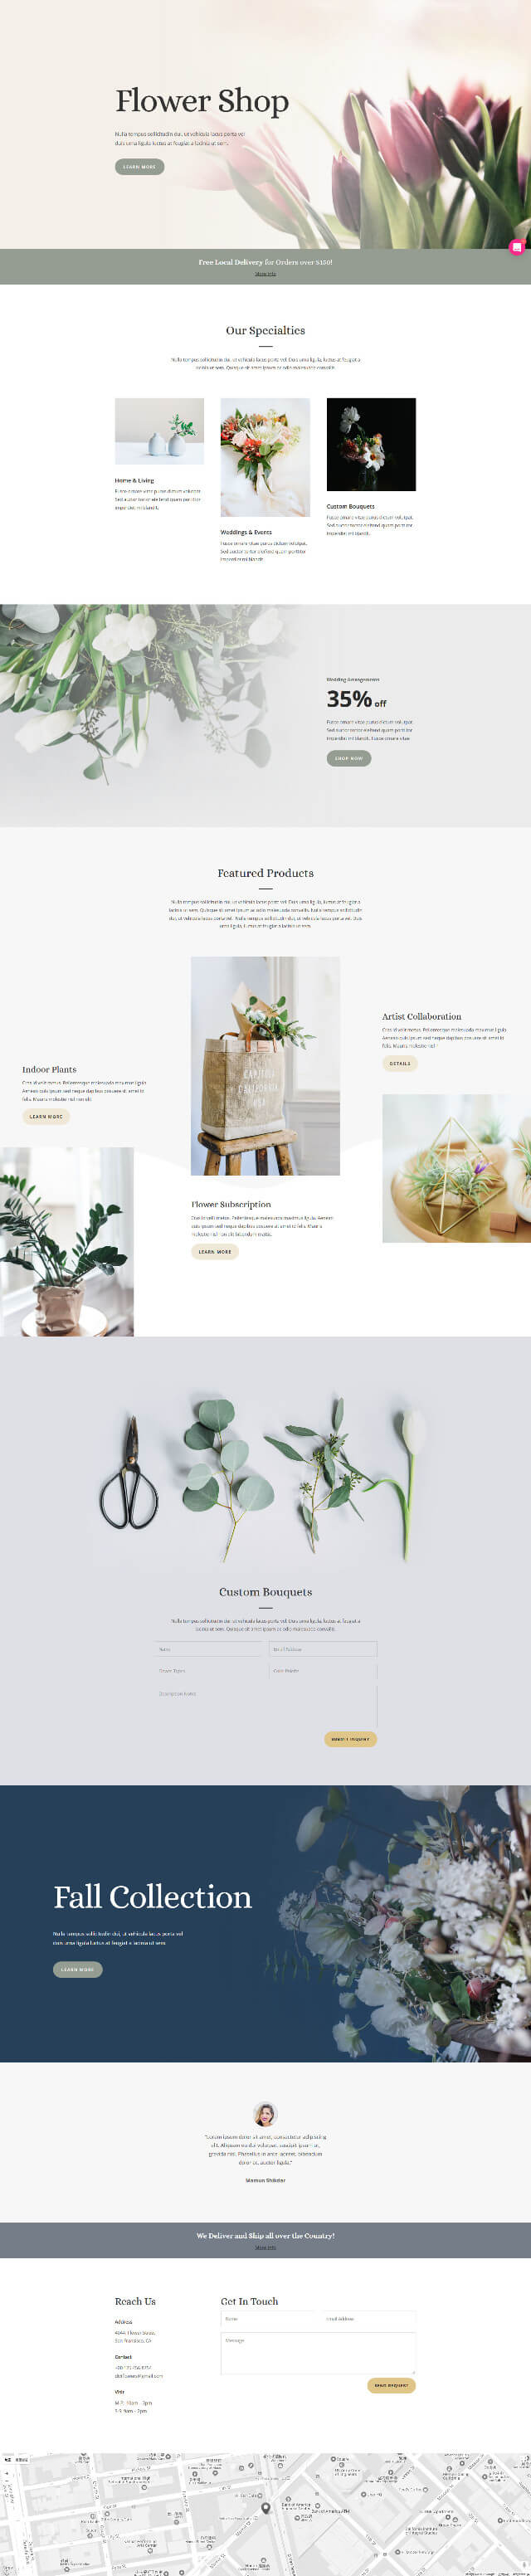 Free Divi Florist Layout Pack – 免費花店樣版下載